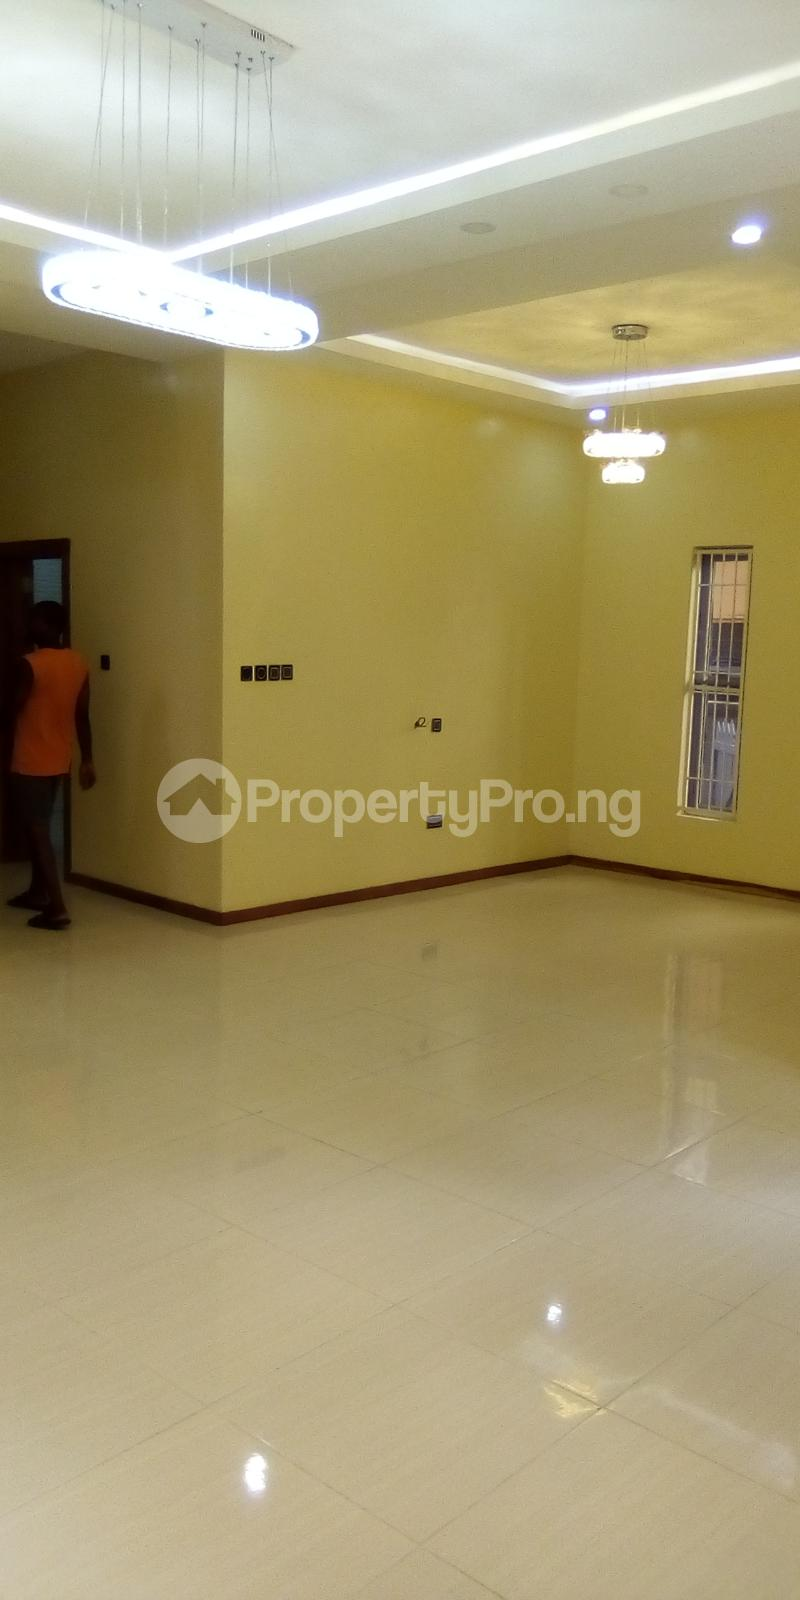 5 bedroom Detached Duplex for sale Southern View Oral Estate Lekki Lagos - 2